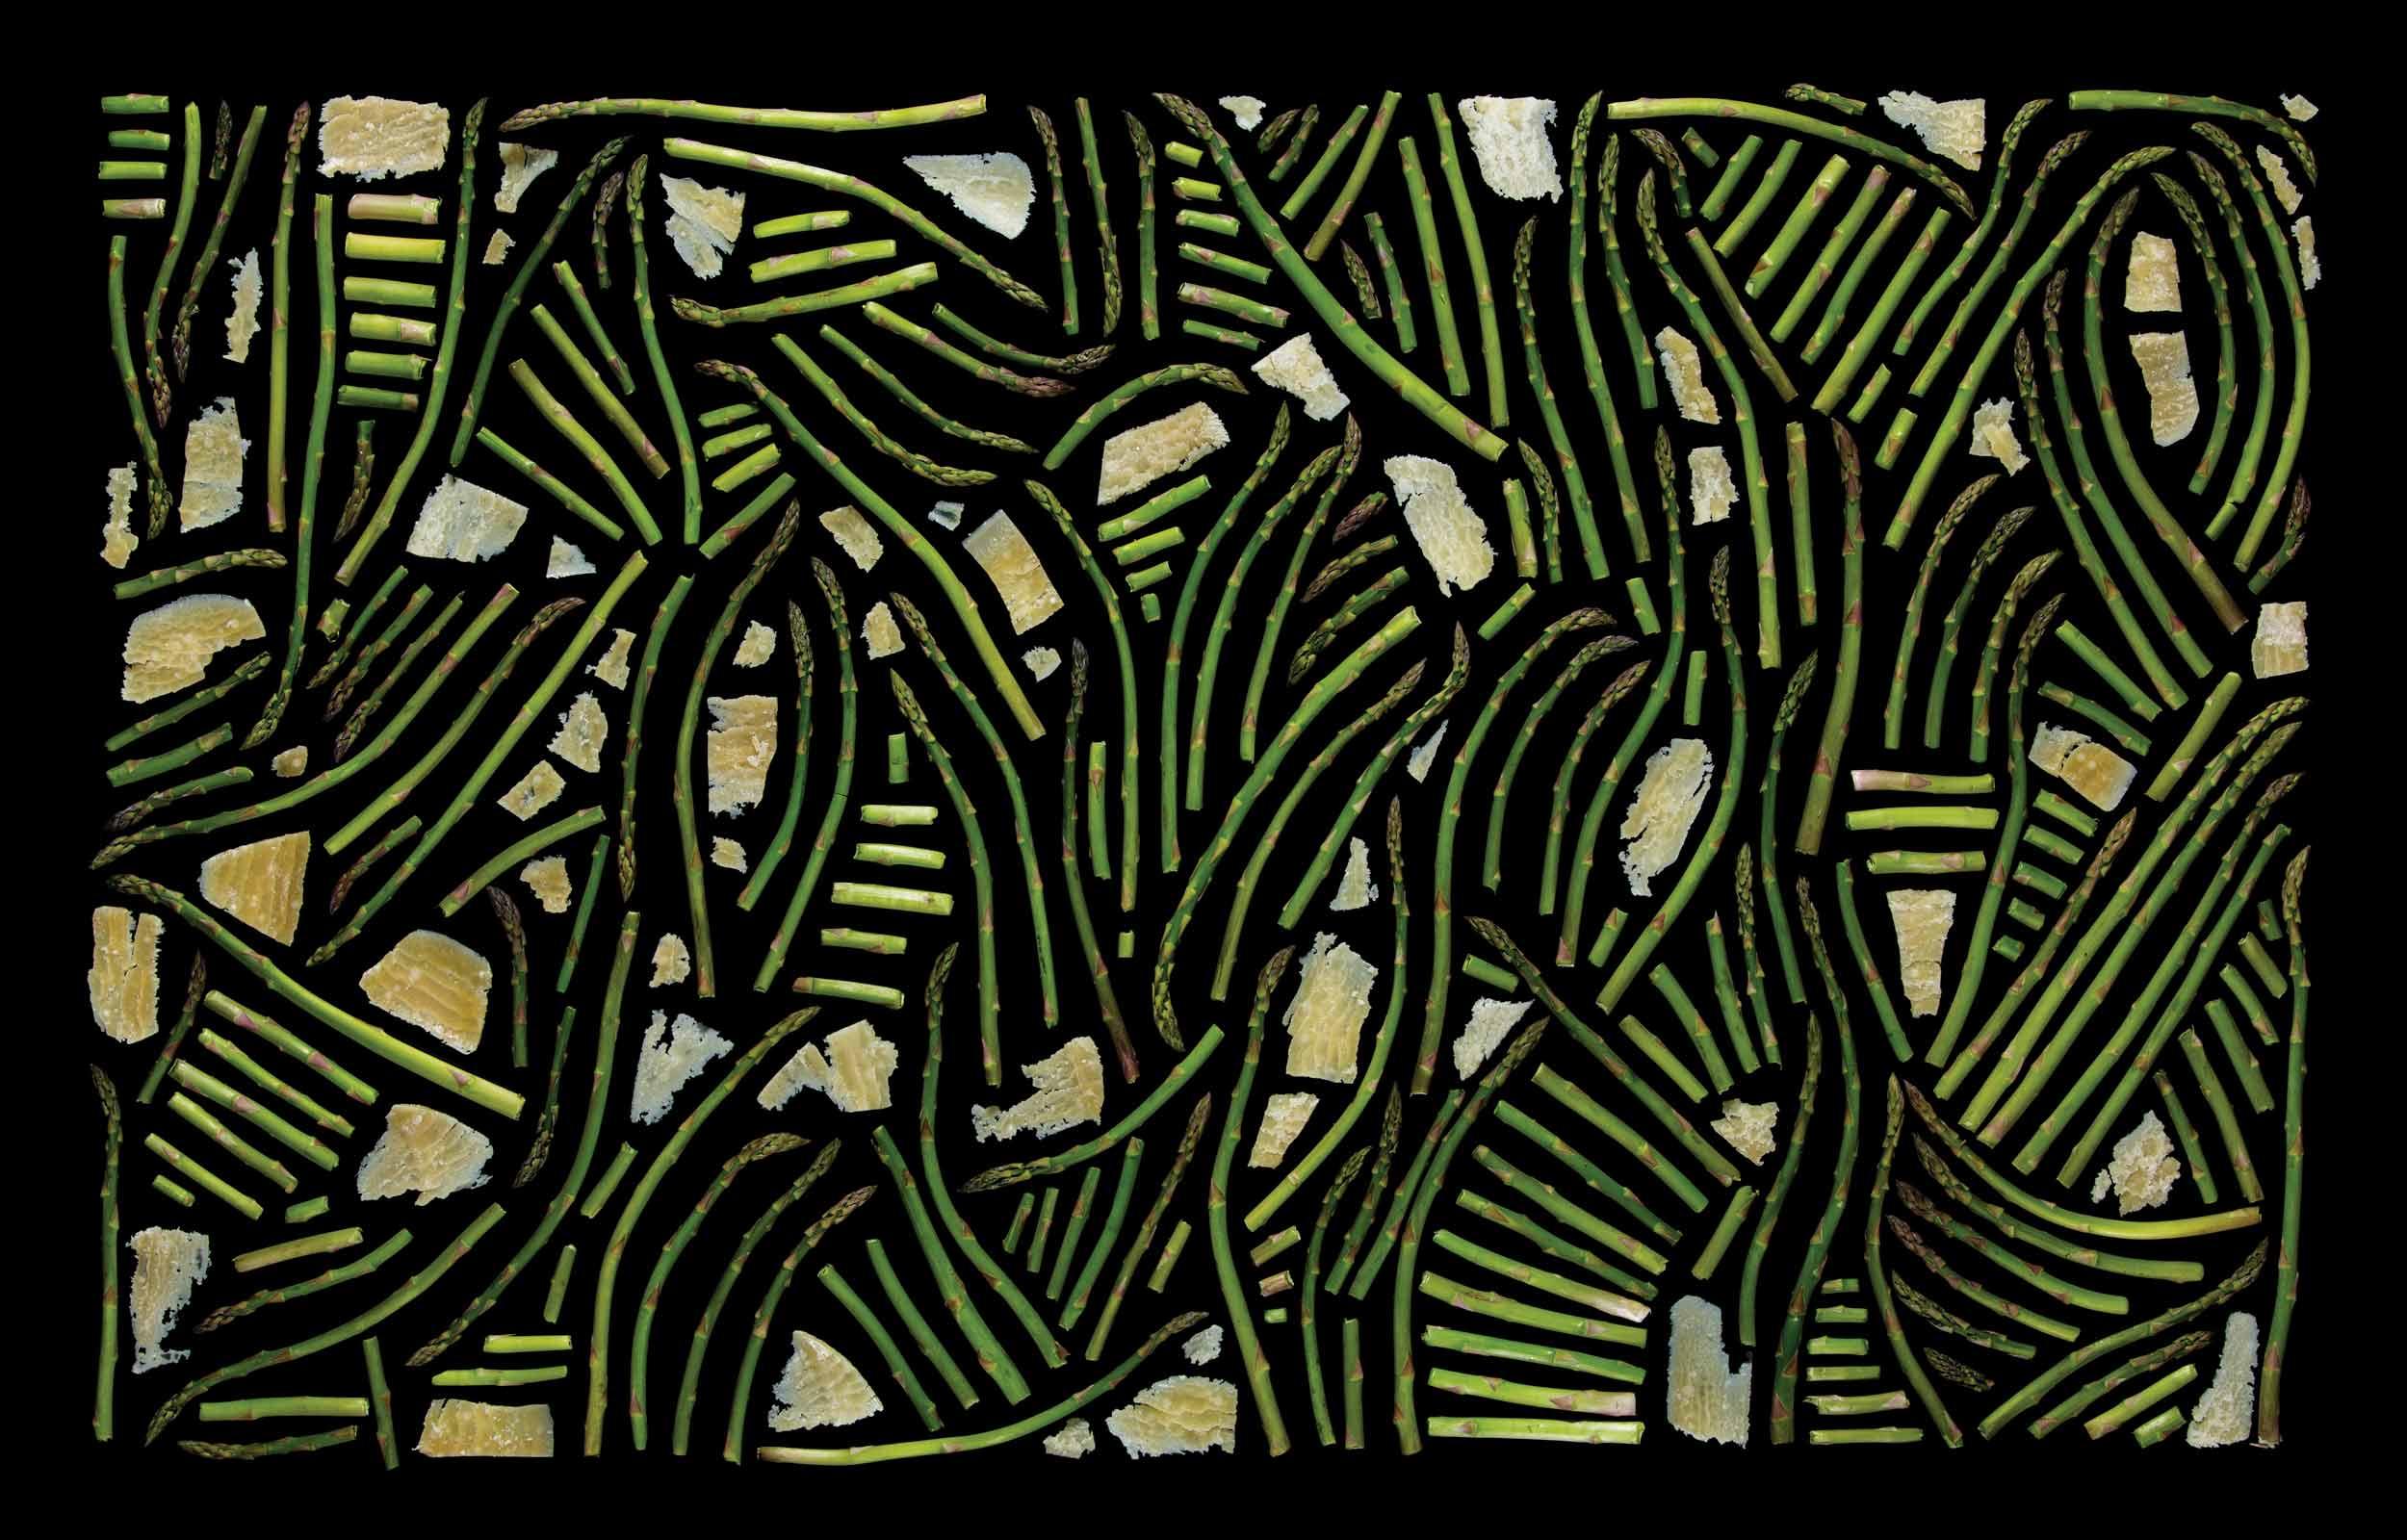 barneys-brian-kelley-asparagus-2500px.jpg